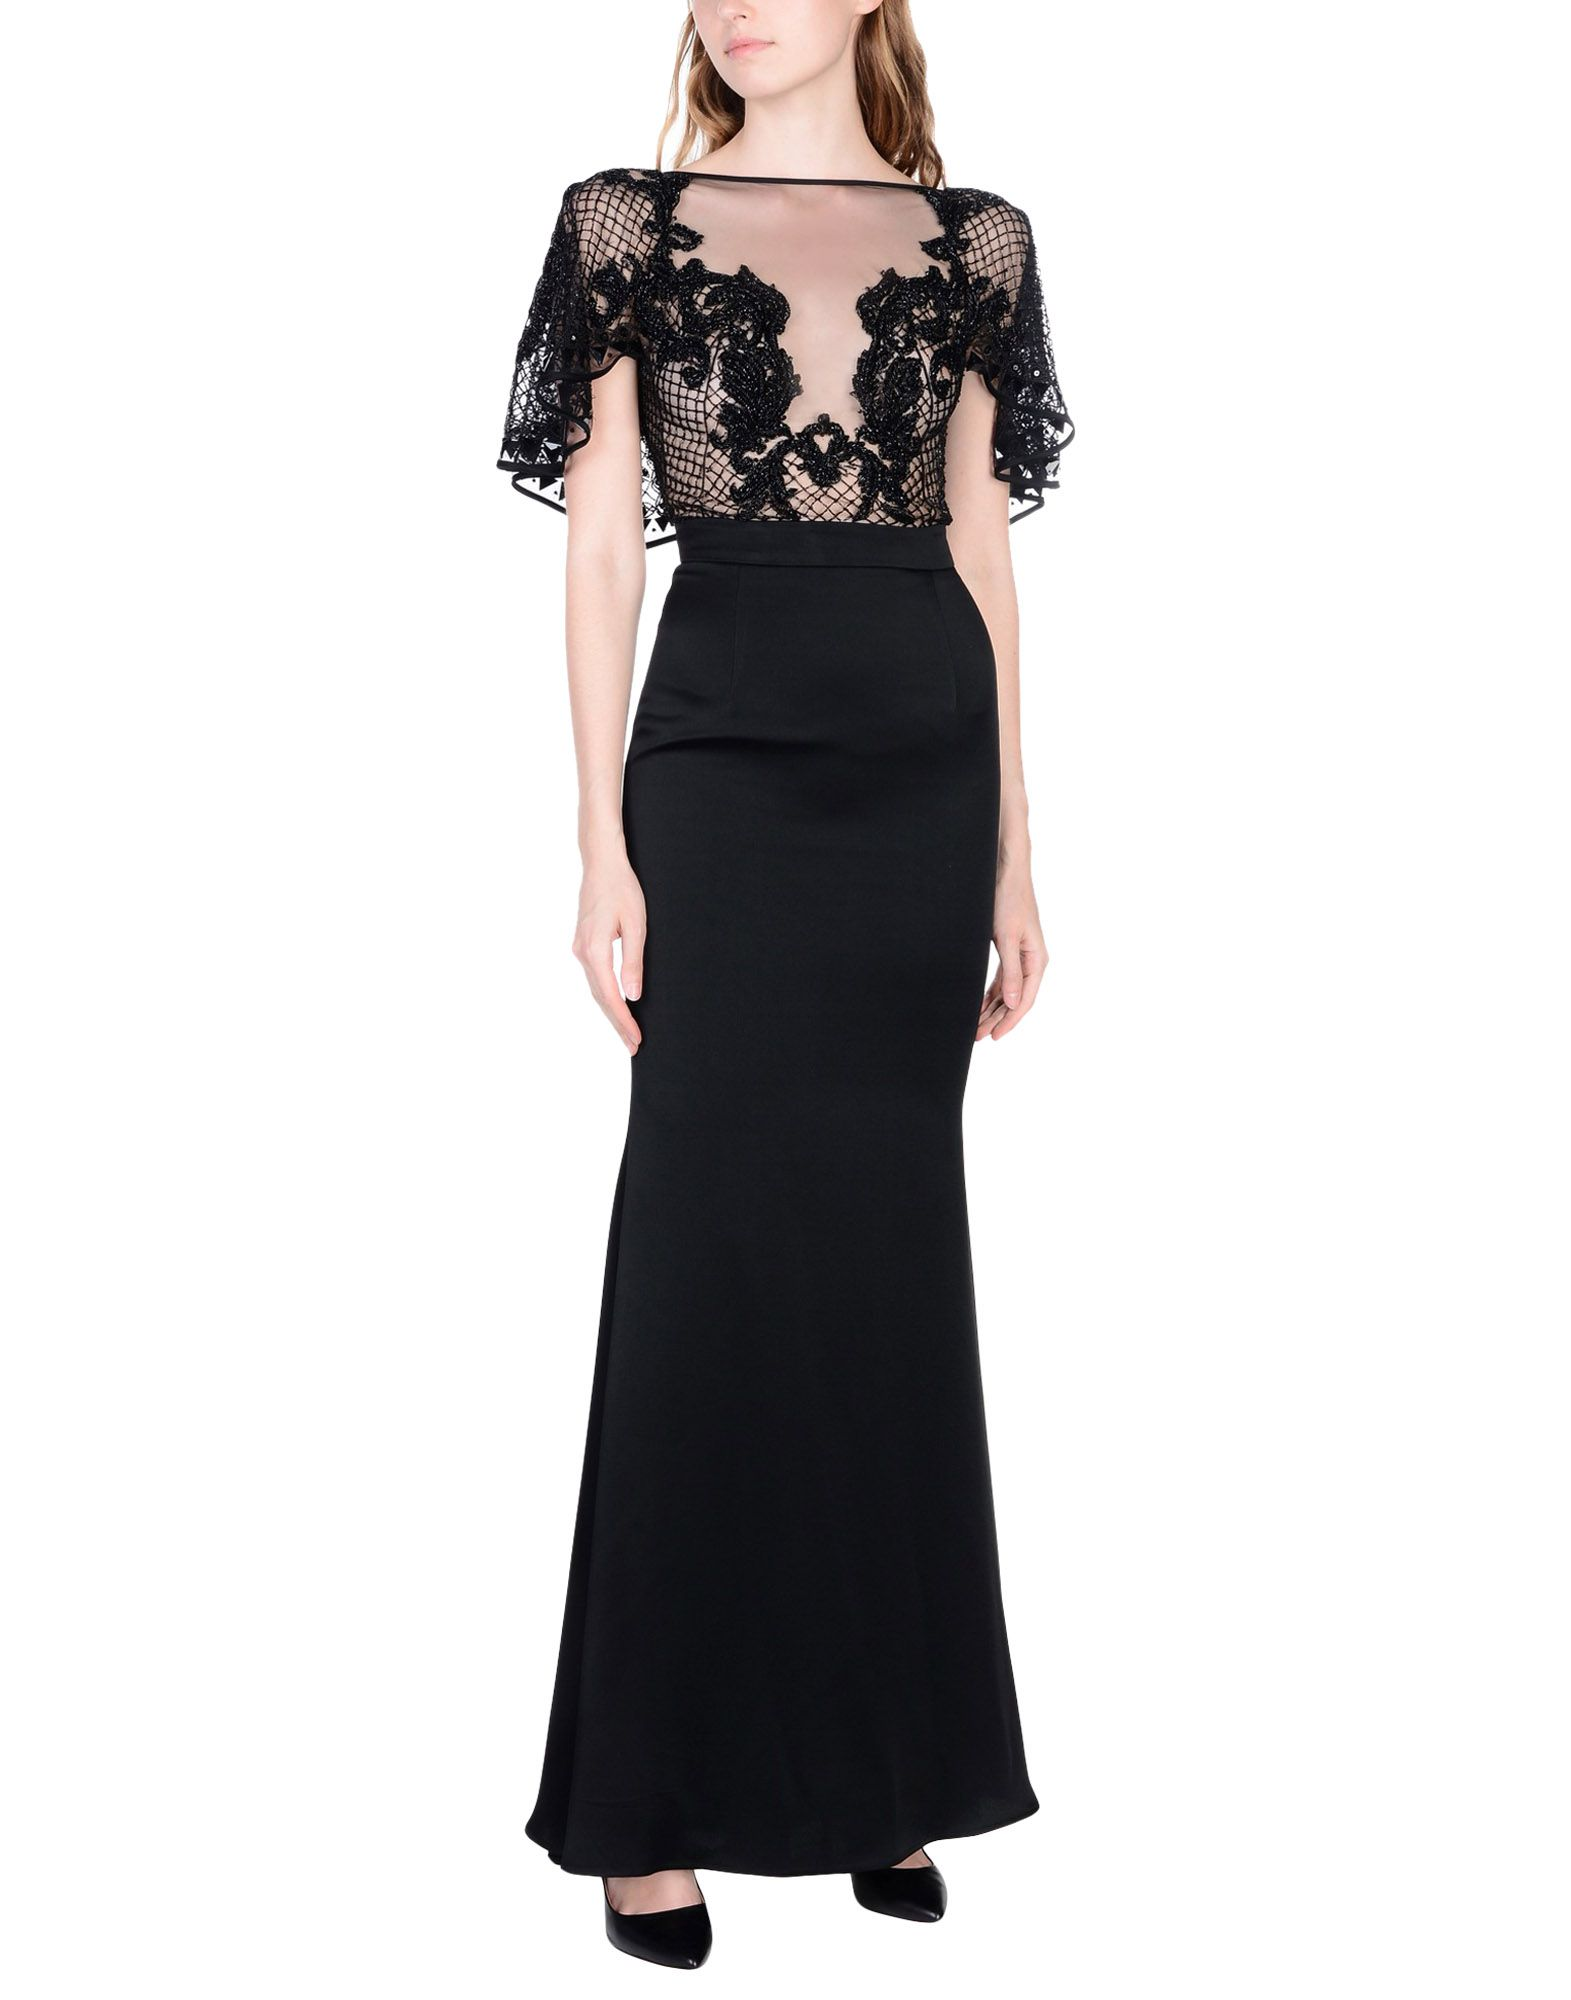 AMEN COUTURE Long Dress in Black